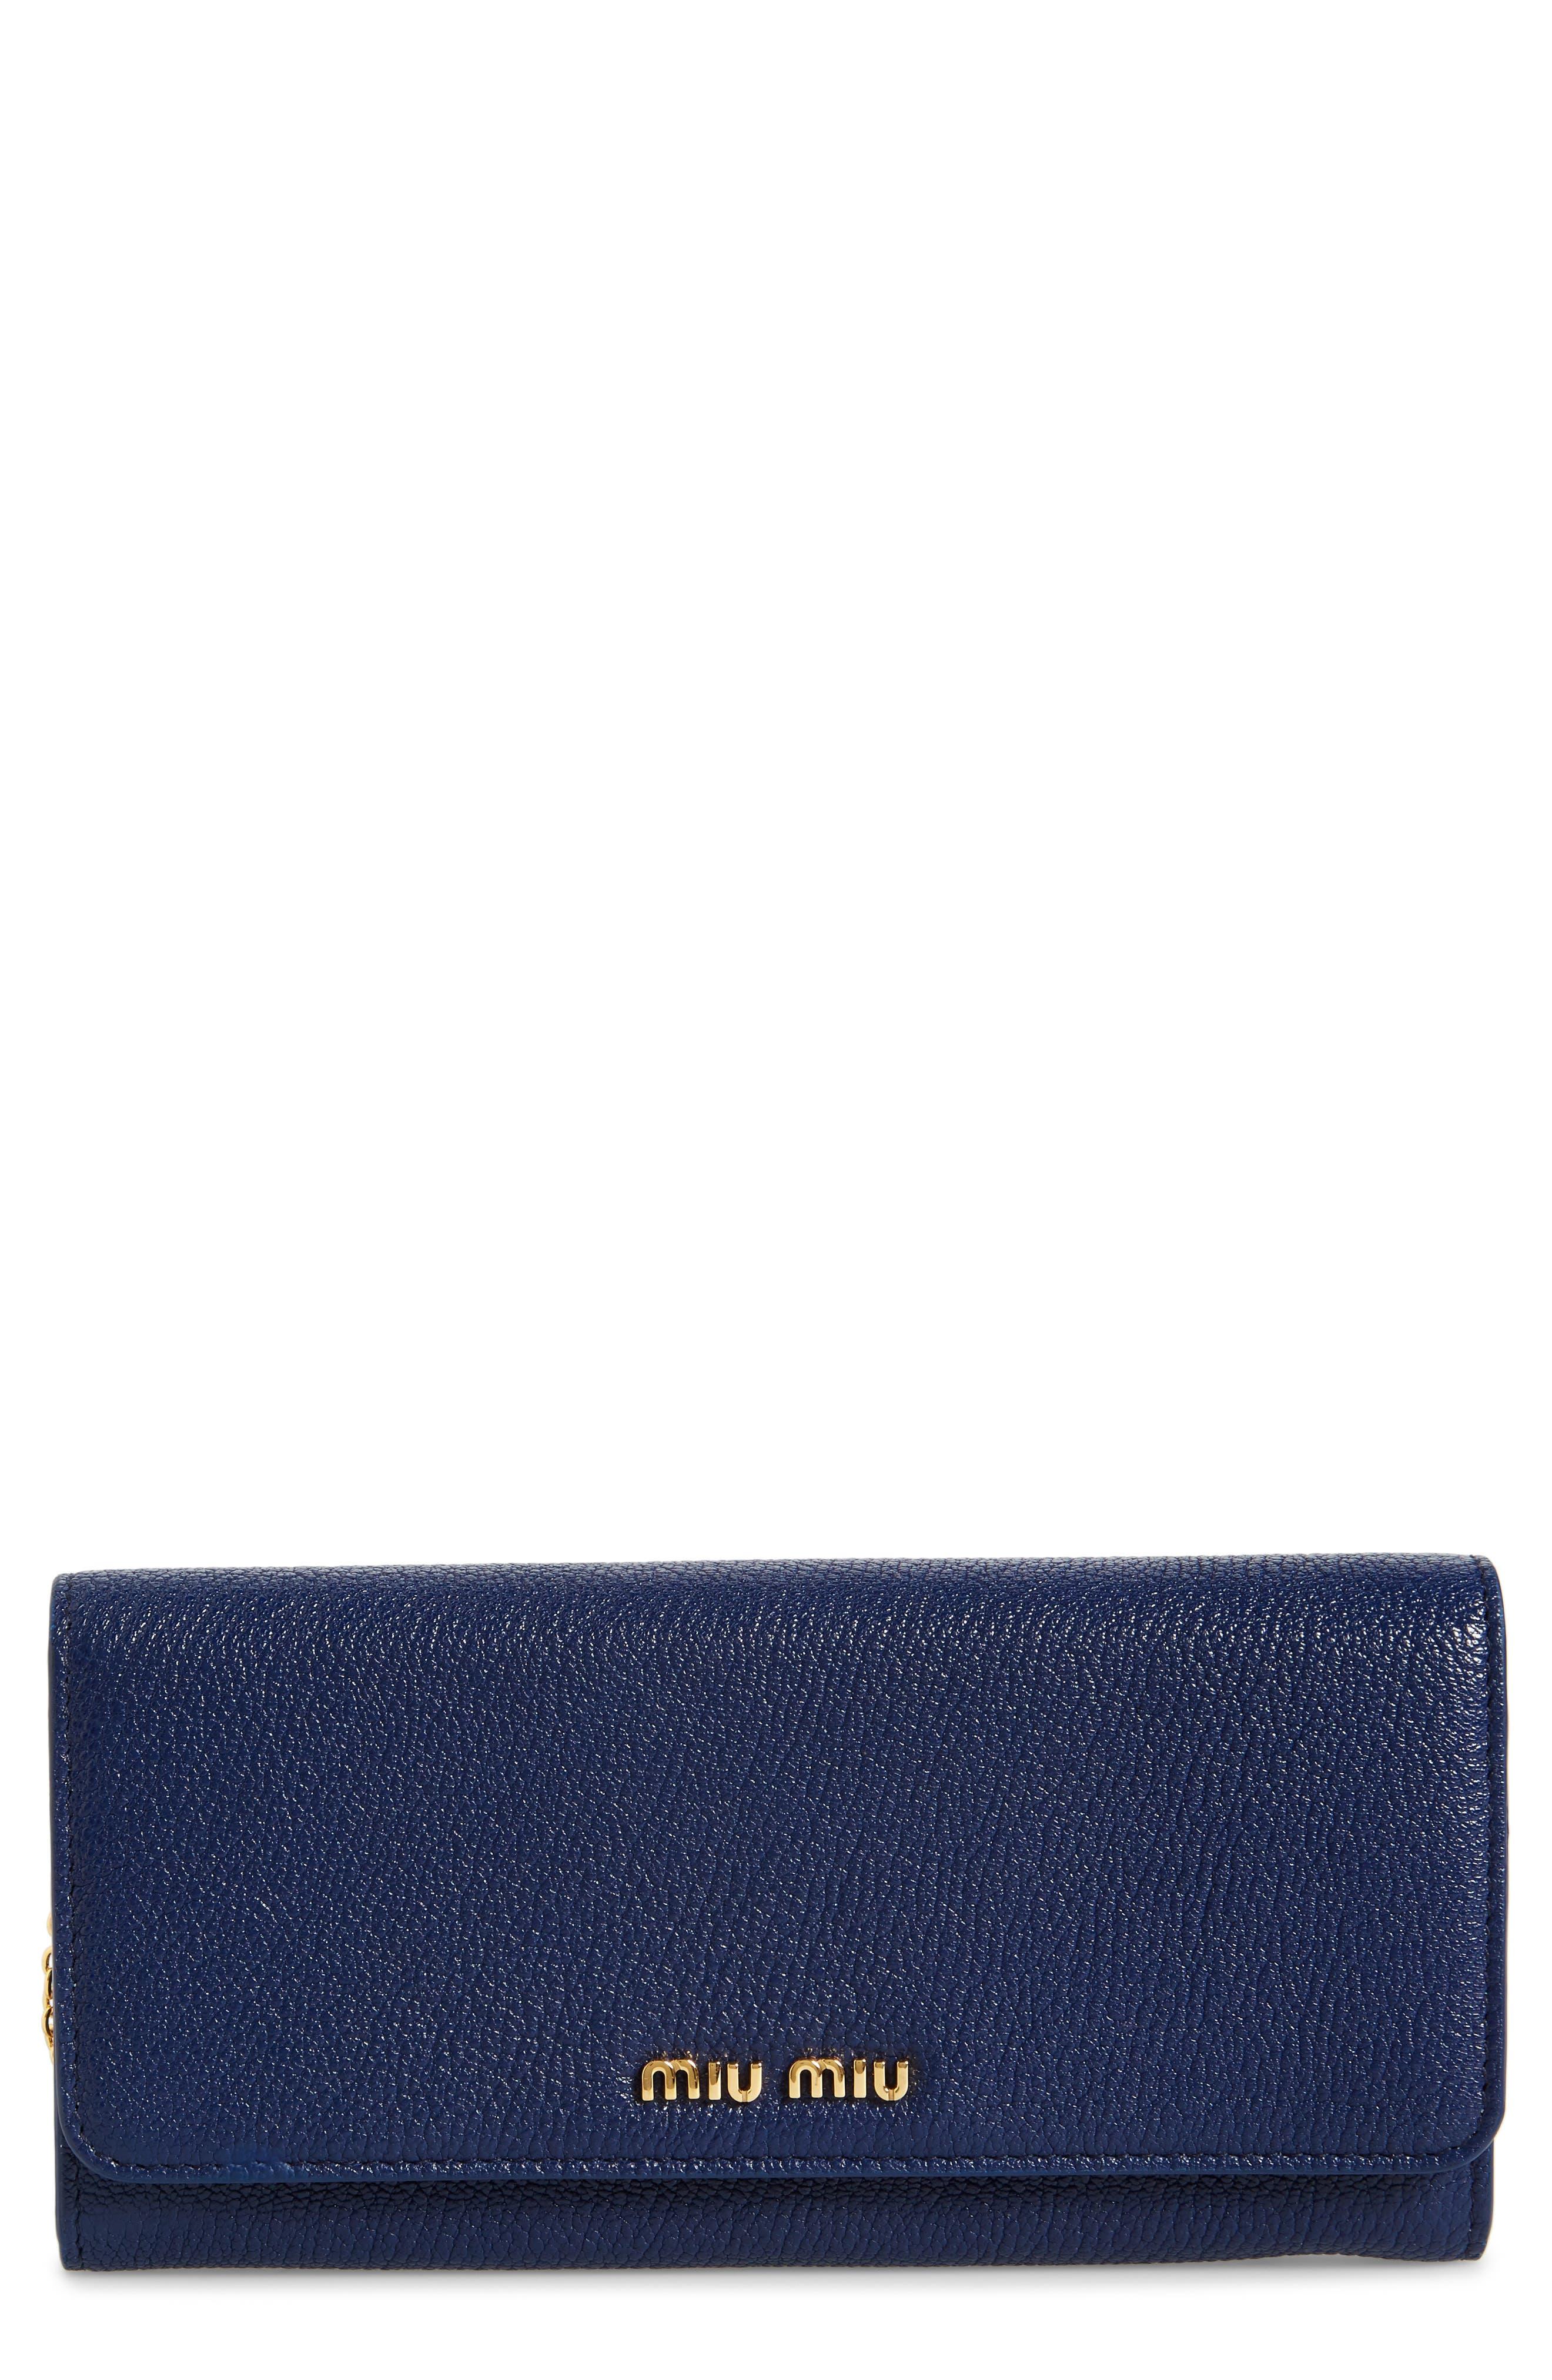 Alternate Image 1 Selected - Miu Miu Madras Goatskin Leather Continental Wallet